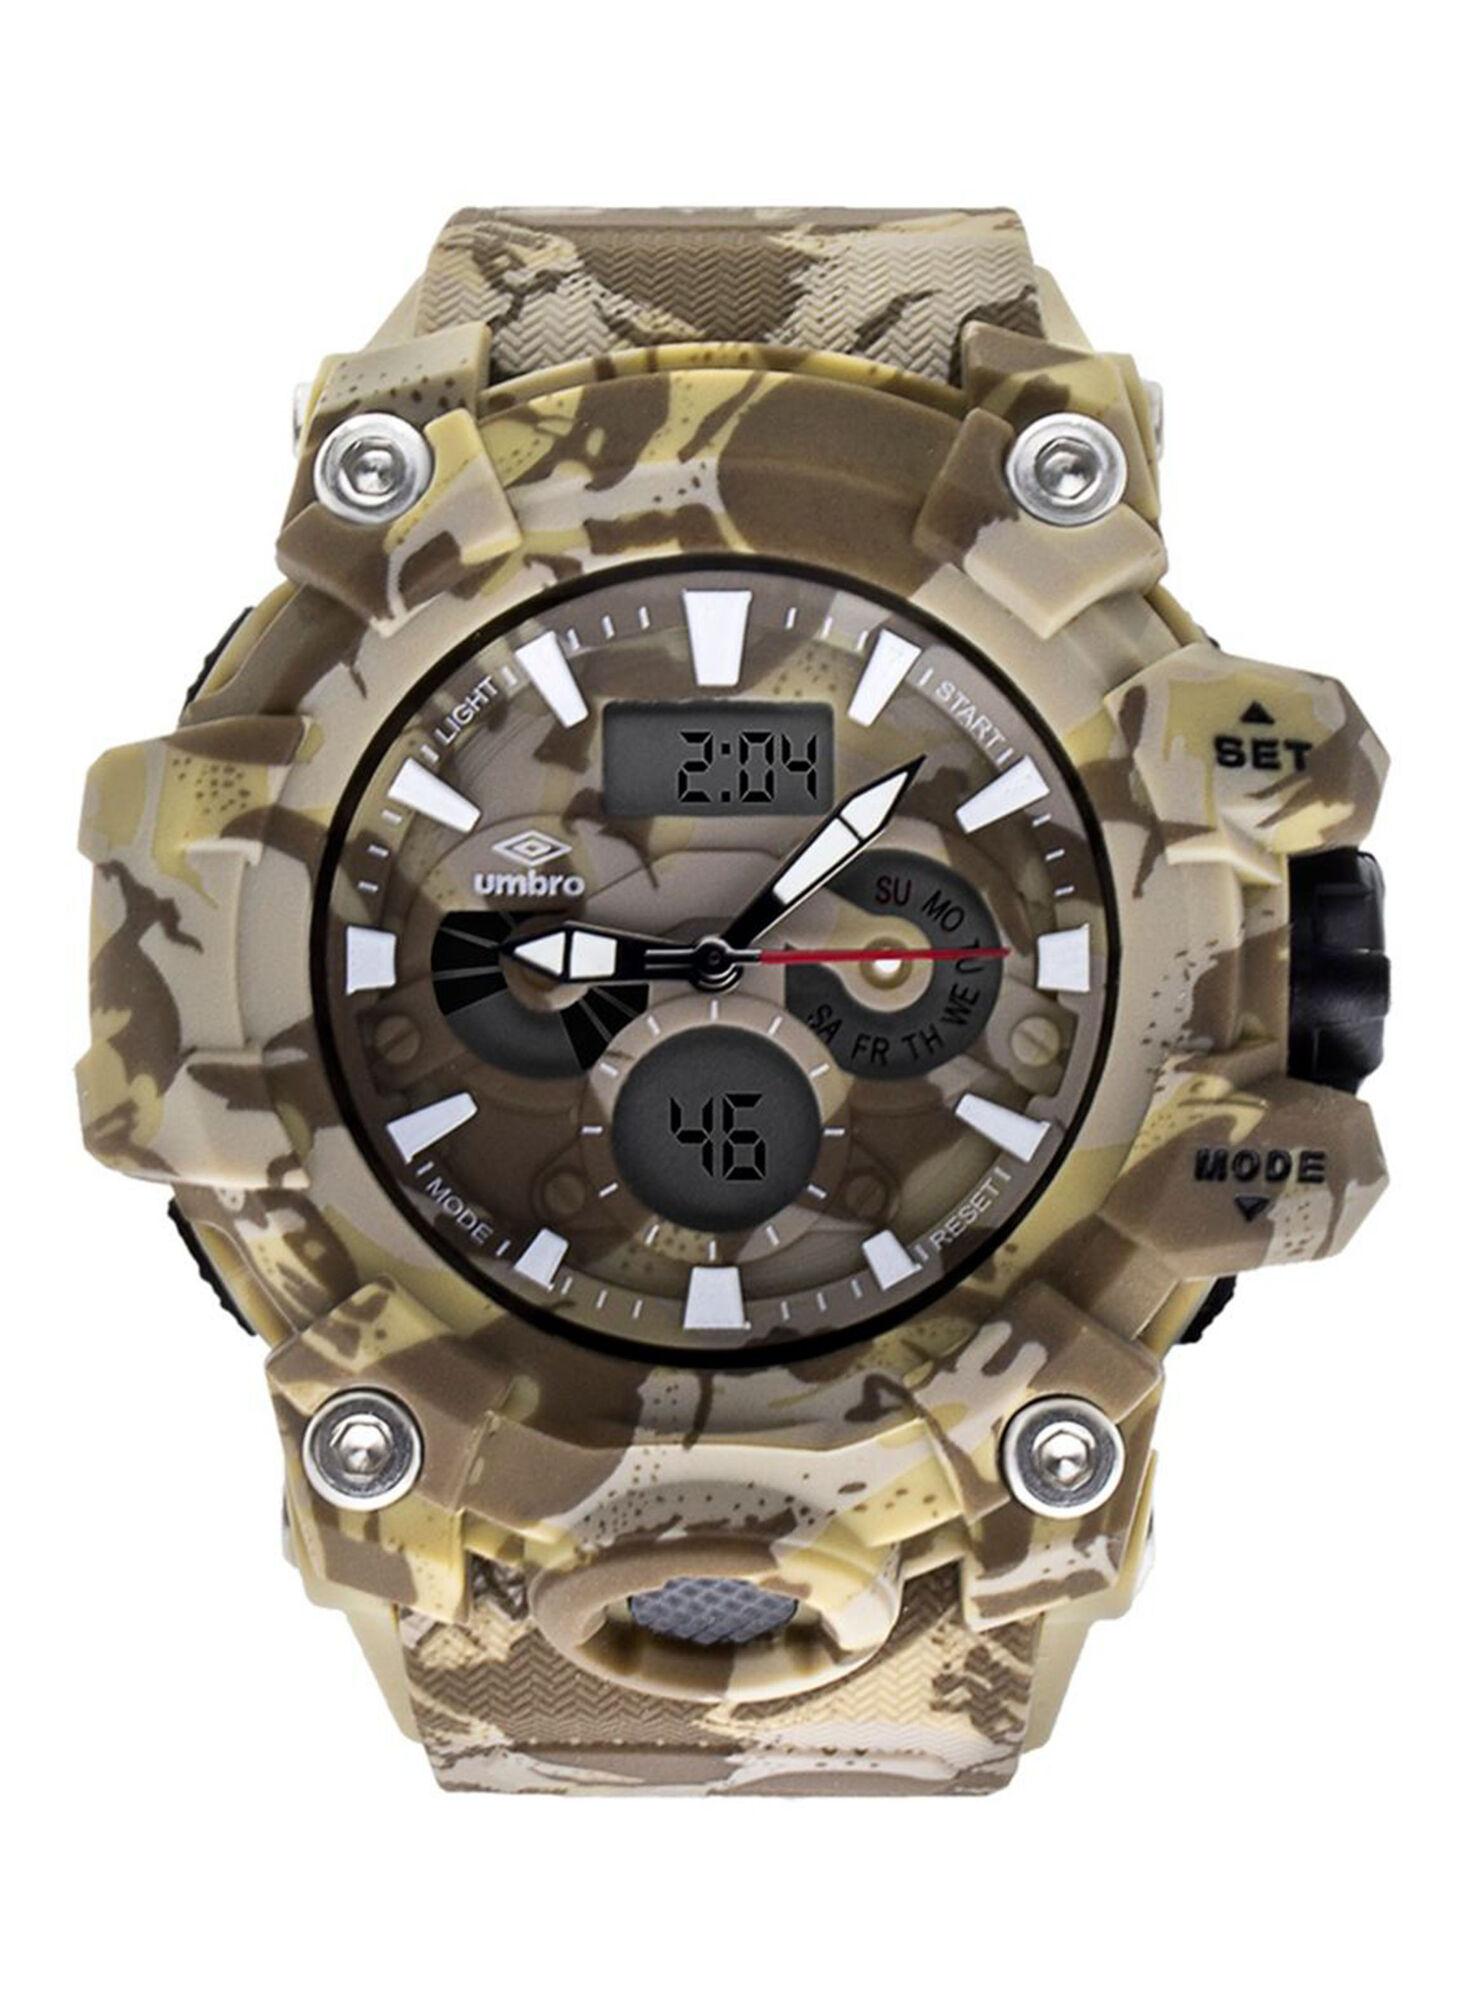 Reloj Digital Umbro UMB-074-5 Hombre - Relojes  d12dc99cedc7f